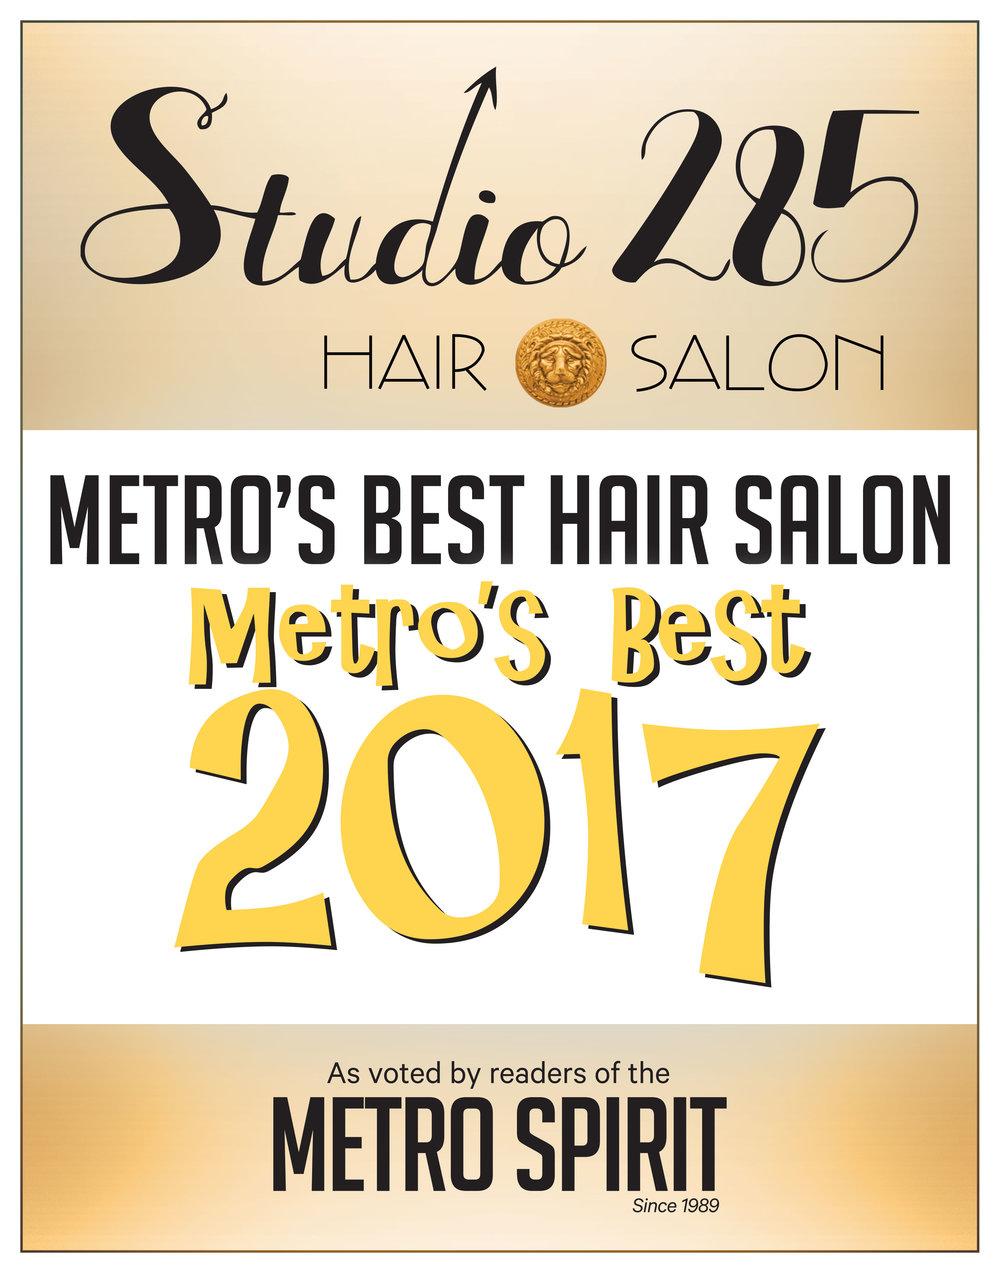 Metro's best 2017